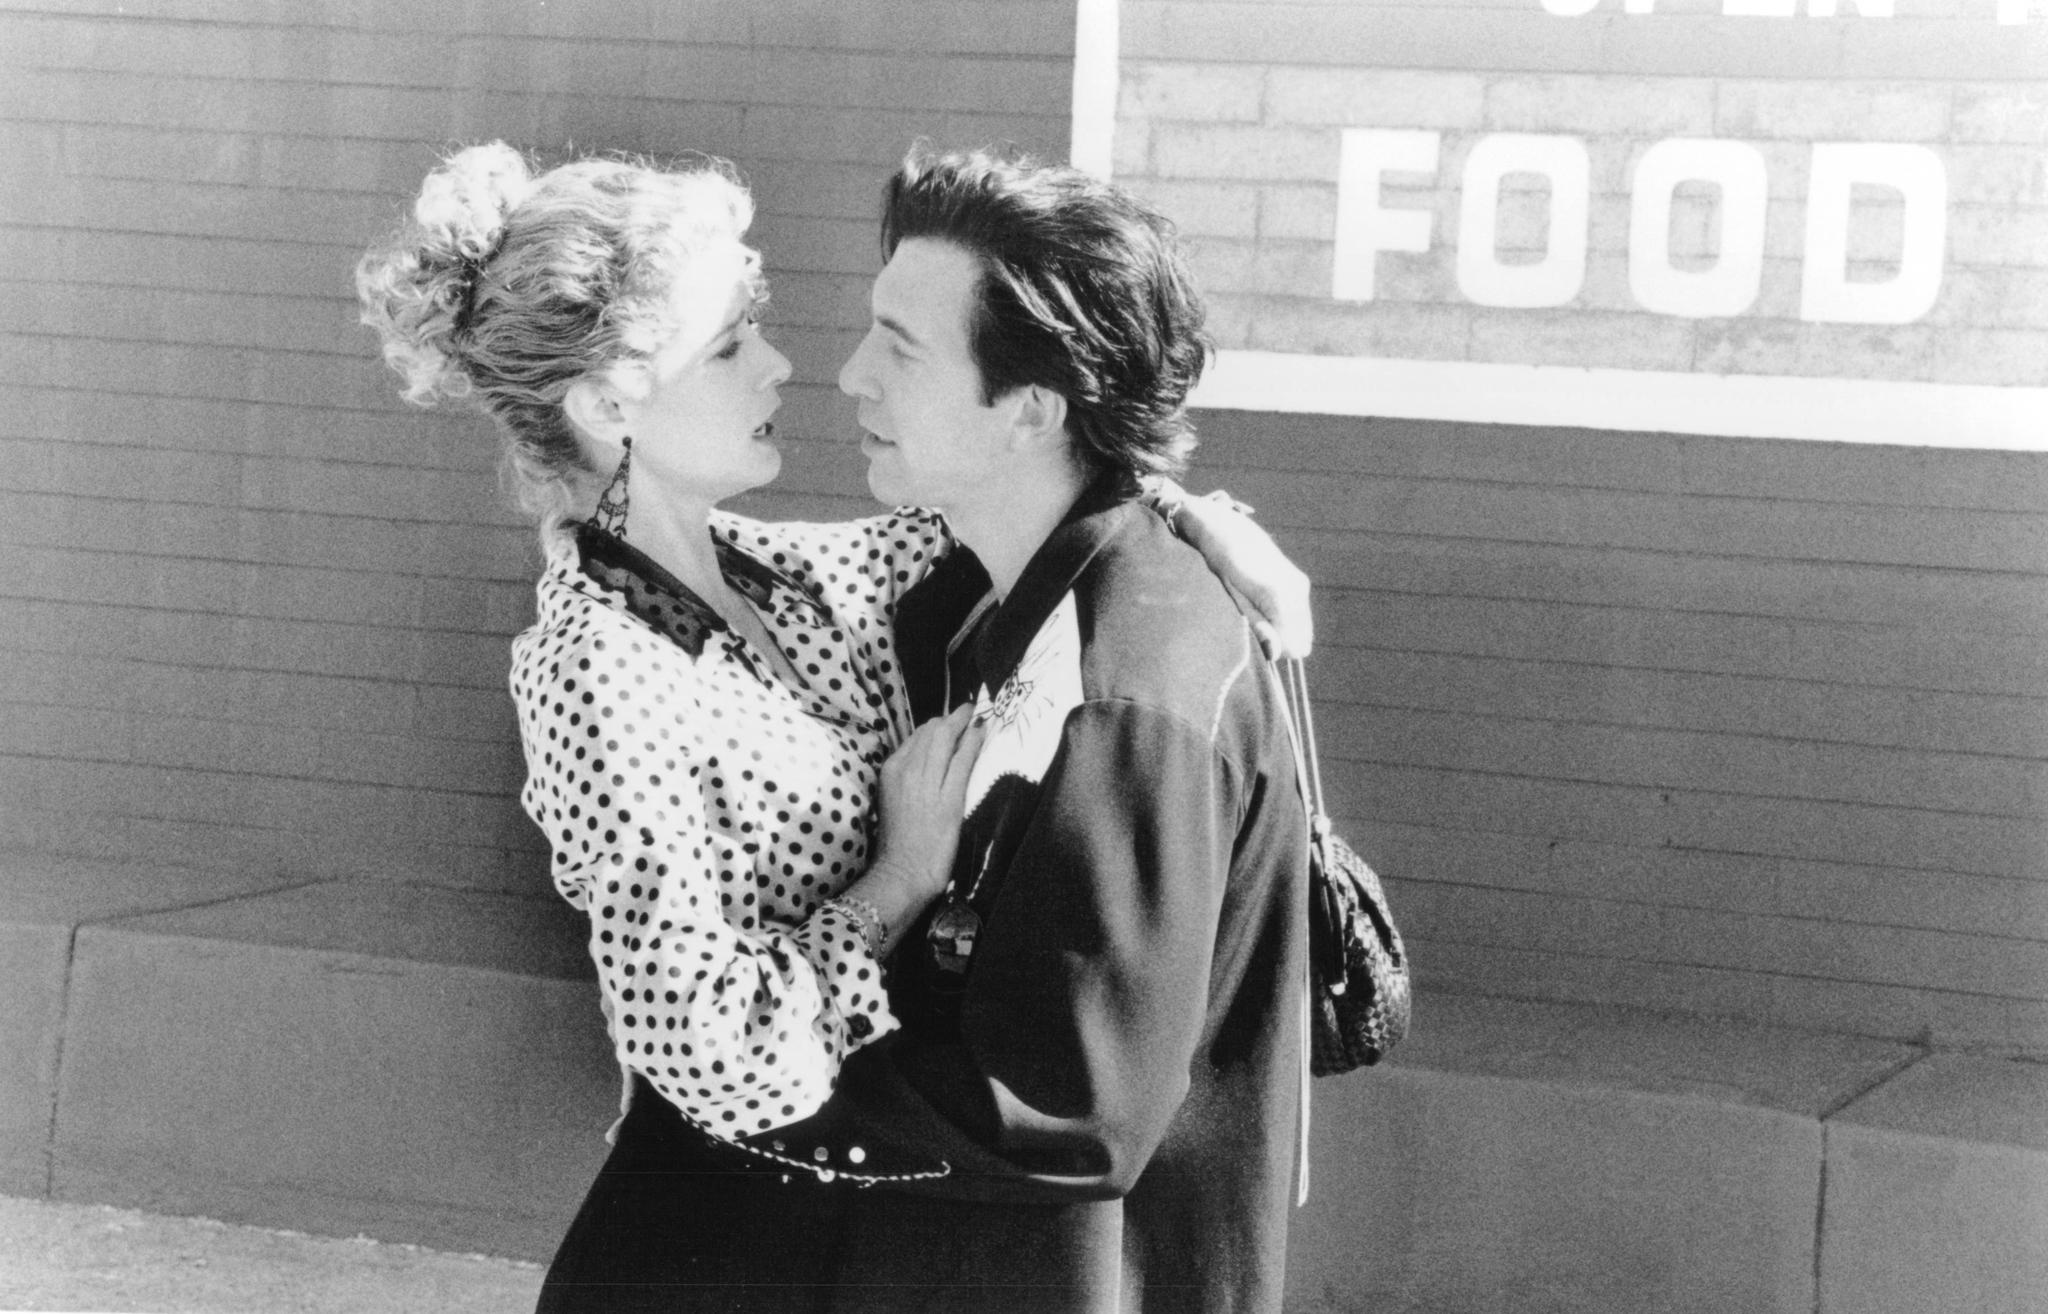 Dylan McDermott and Nancy Travis in Destiny Turns on the Radio (1995)